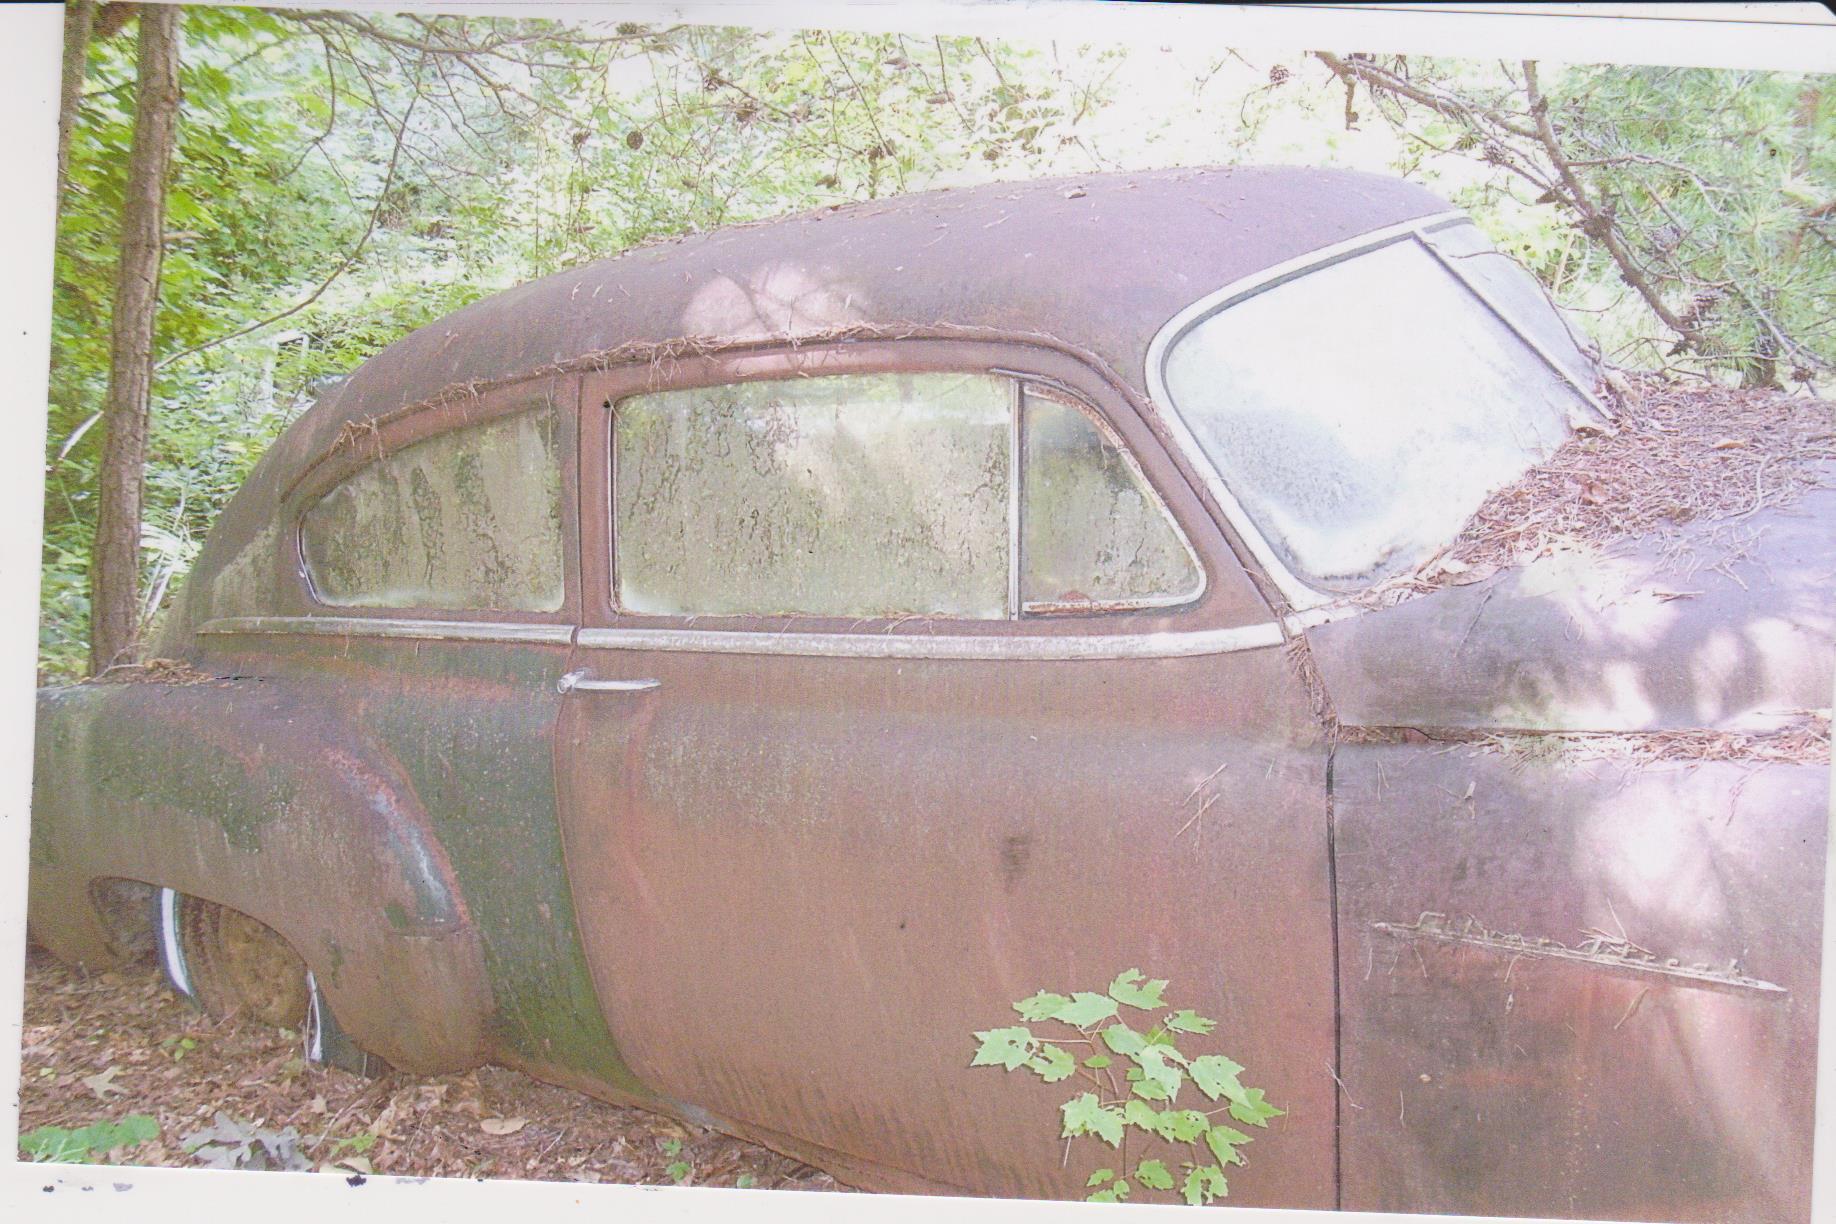 Click image for larger version  Name:Pontiac Silver Streak 002.jpg Views:73 Size:351.5 KB ID:75817